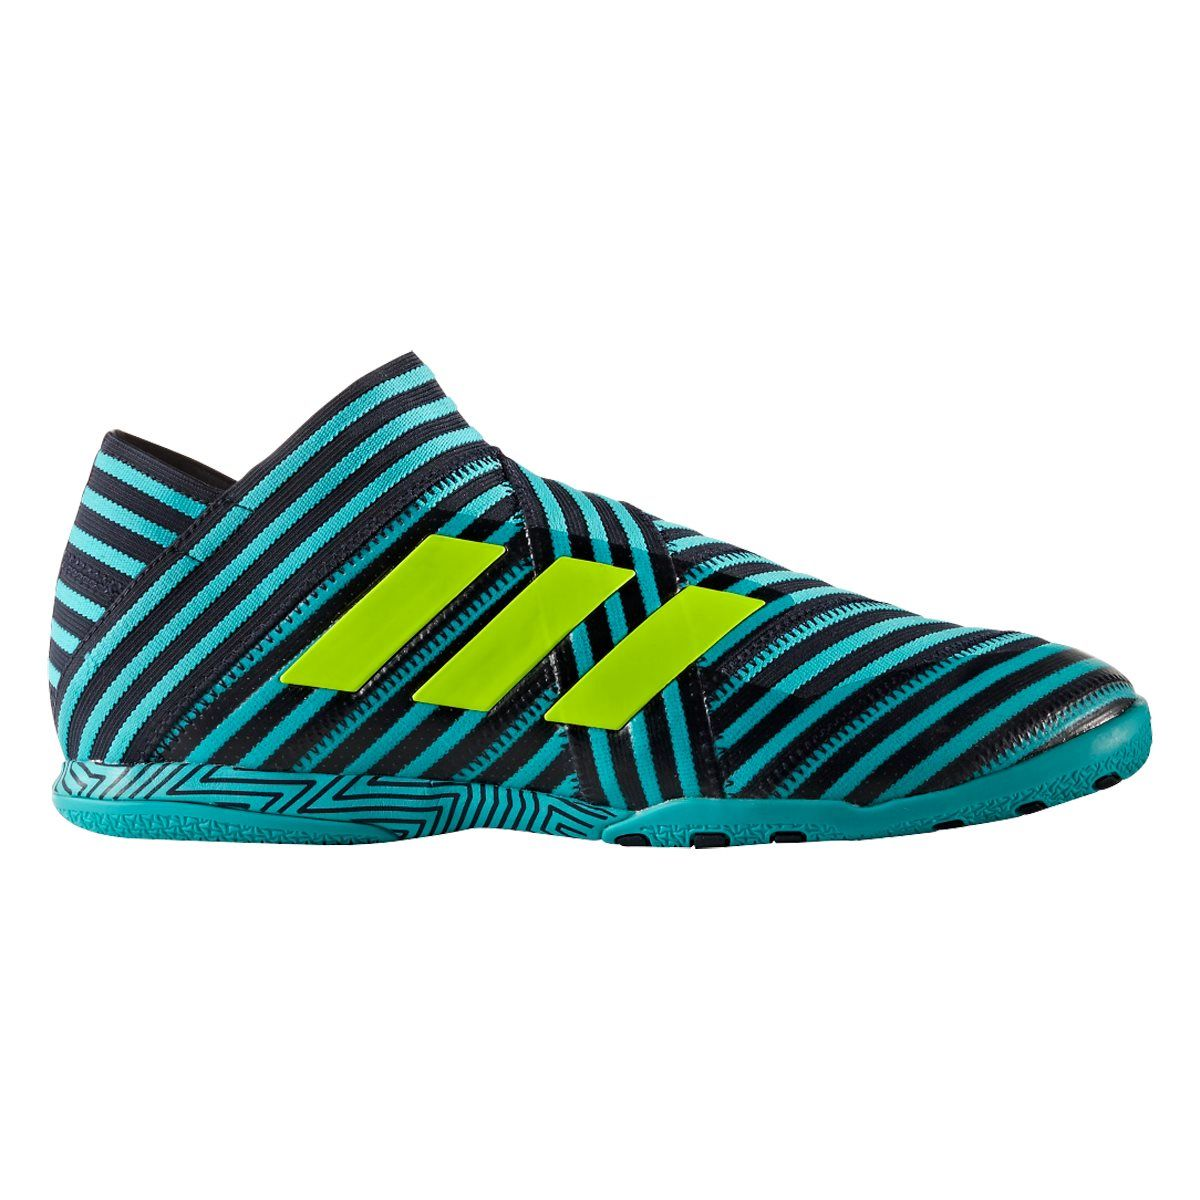 adidas Ocean Storm | adidas Nemeziz Tango 17+ 360Agility Indoor Soccer Shoes